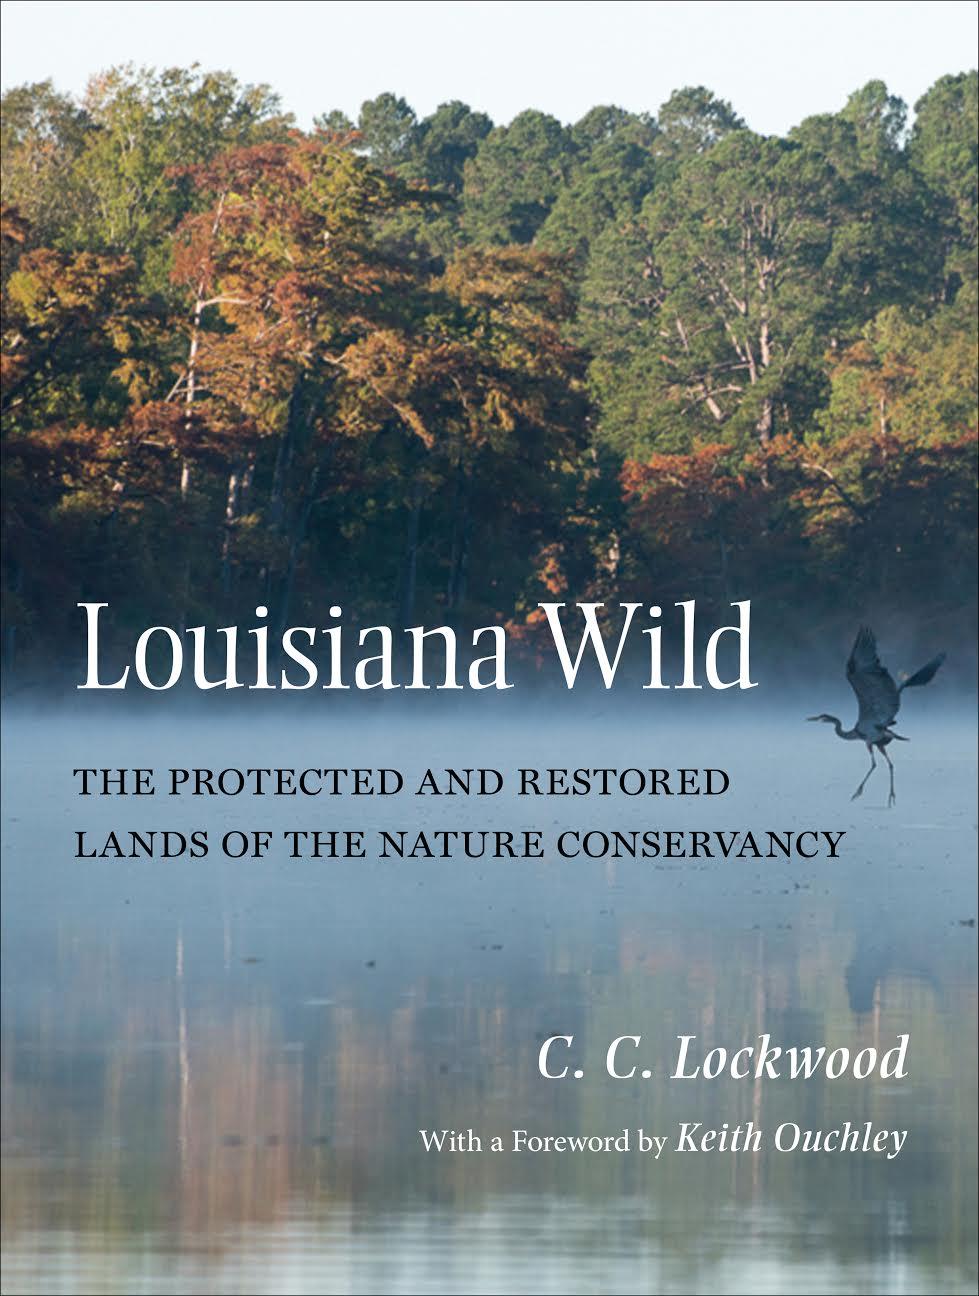 Louisiana Wild by C.C. Lockwood